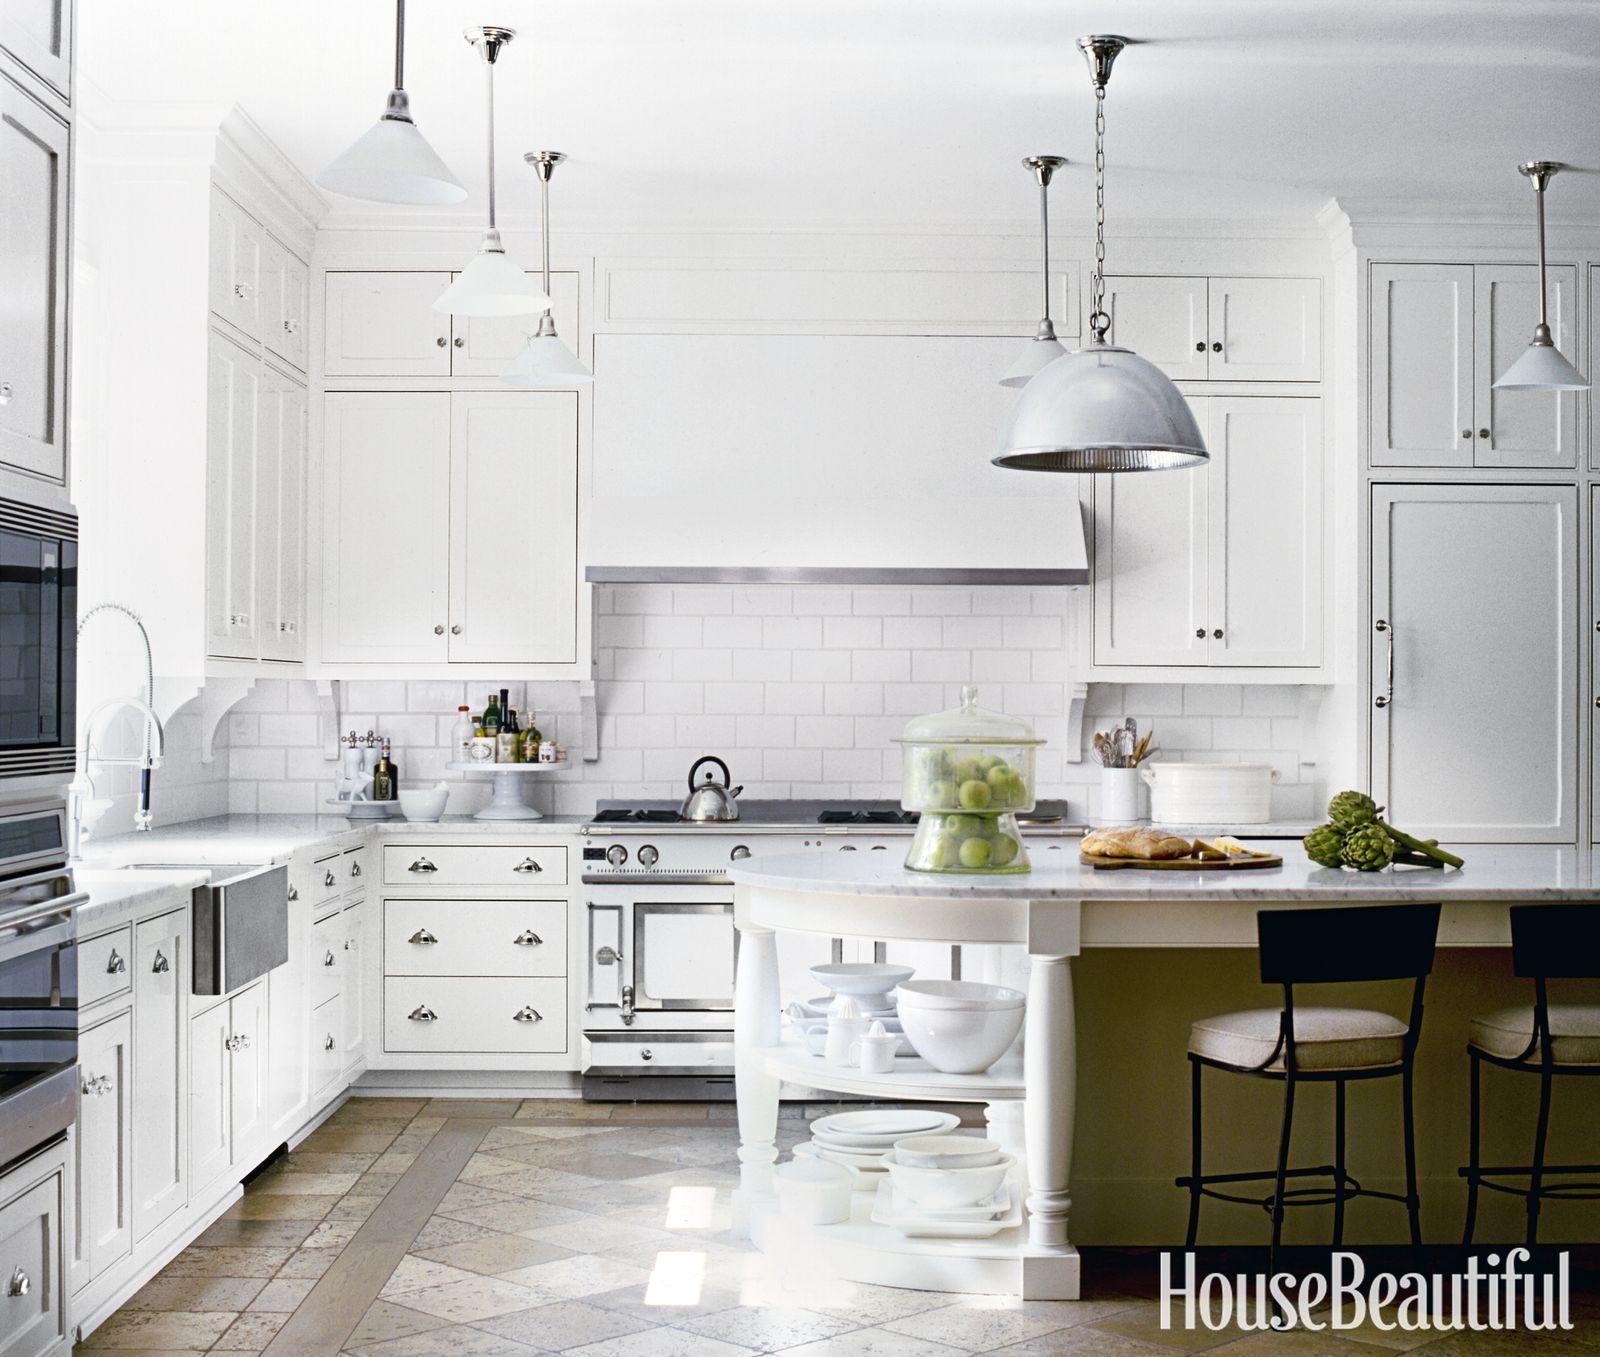 10 Unique Small Kitchen Design Ideas: 10 Totally Unique Ways To Tile Your Kitchen Floor